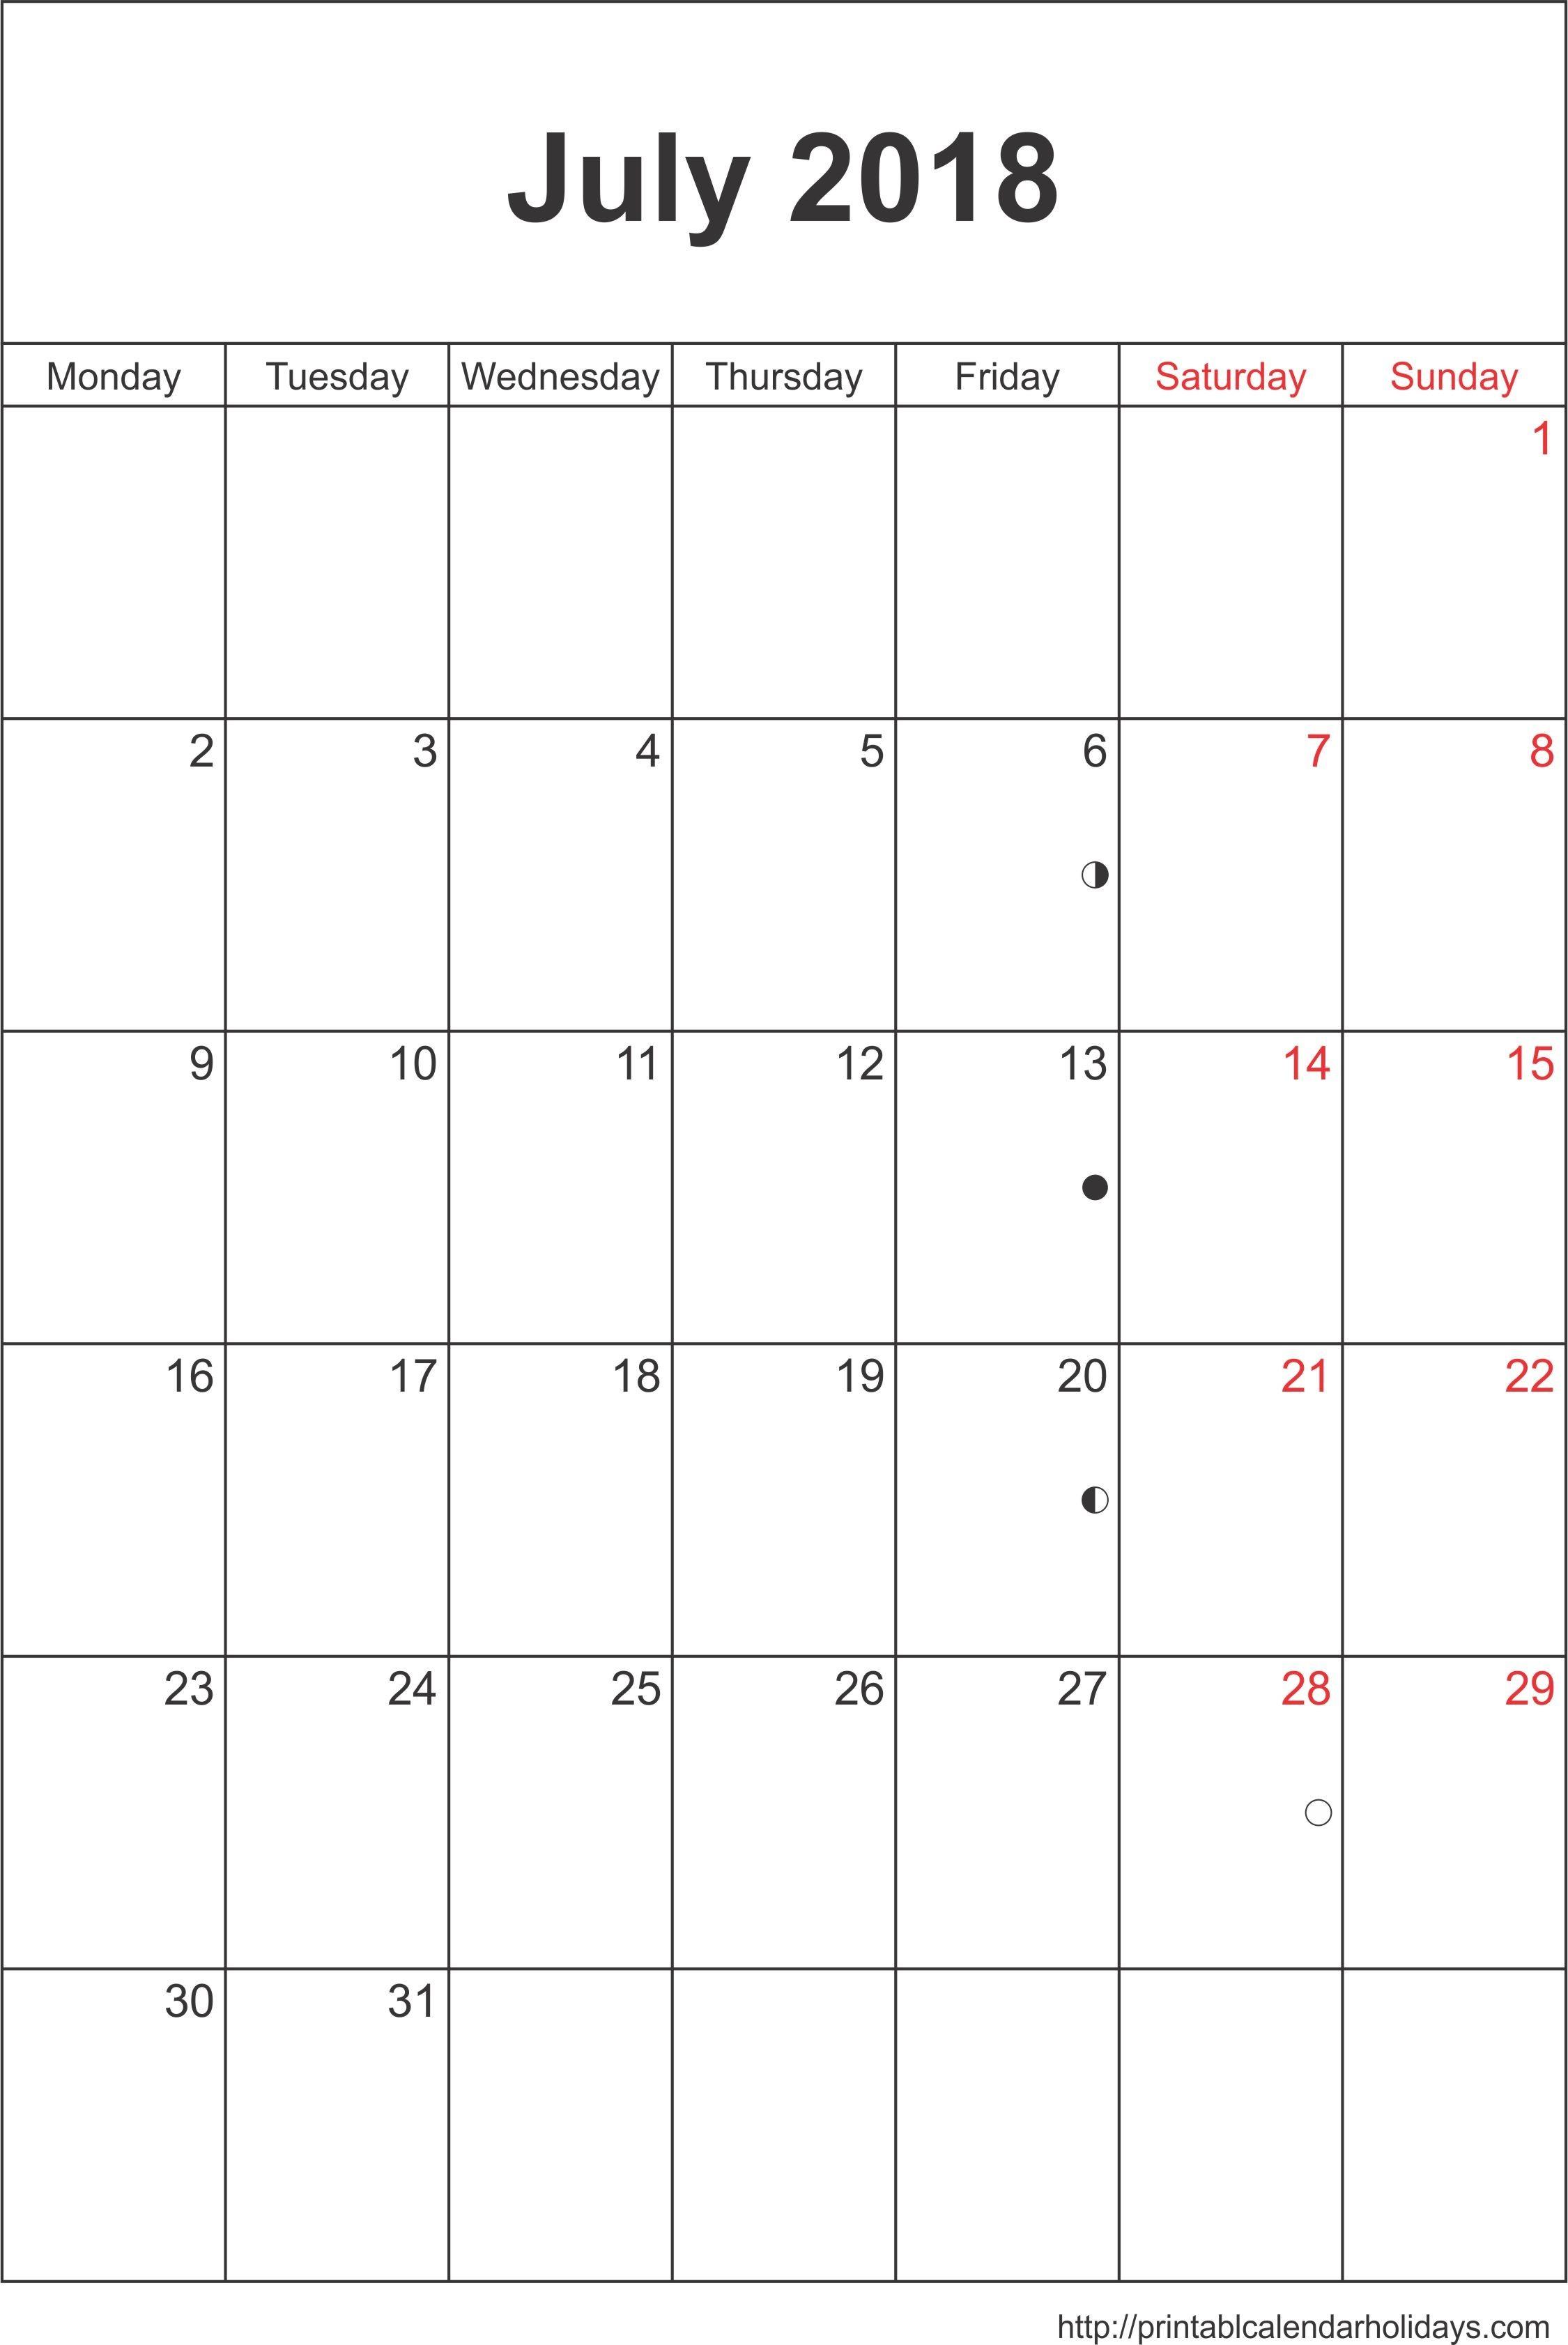 Calendar 2019 Free Download Más Populares Nice 2014 15 Academic Calendar Template S Printable School Of Calendar 2019 Free Download Más Arriba-a-fecha Beautiful 25 Examples Print A Calendar 2019